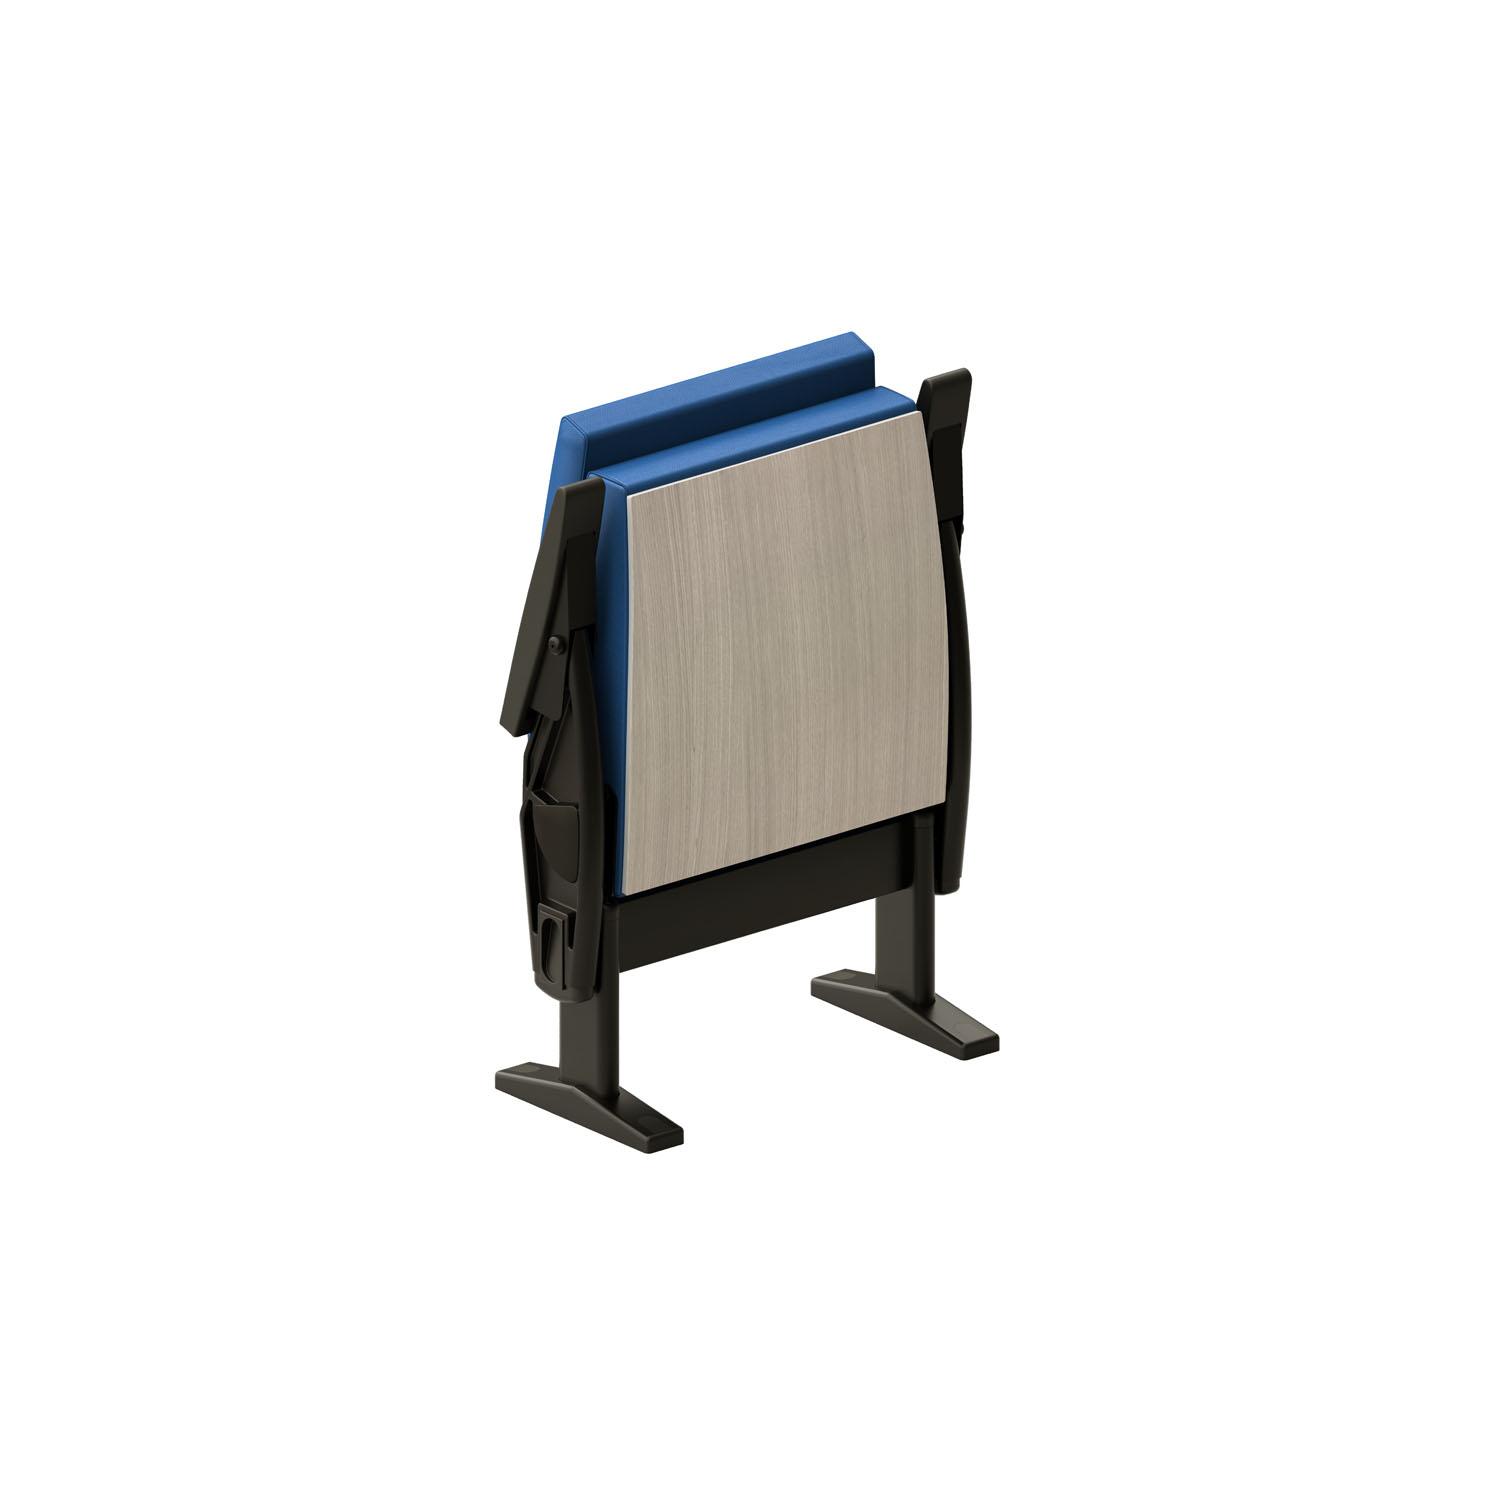 LAMM Futura Chair | Woodwood Group